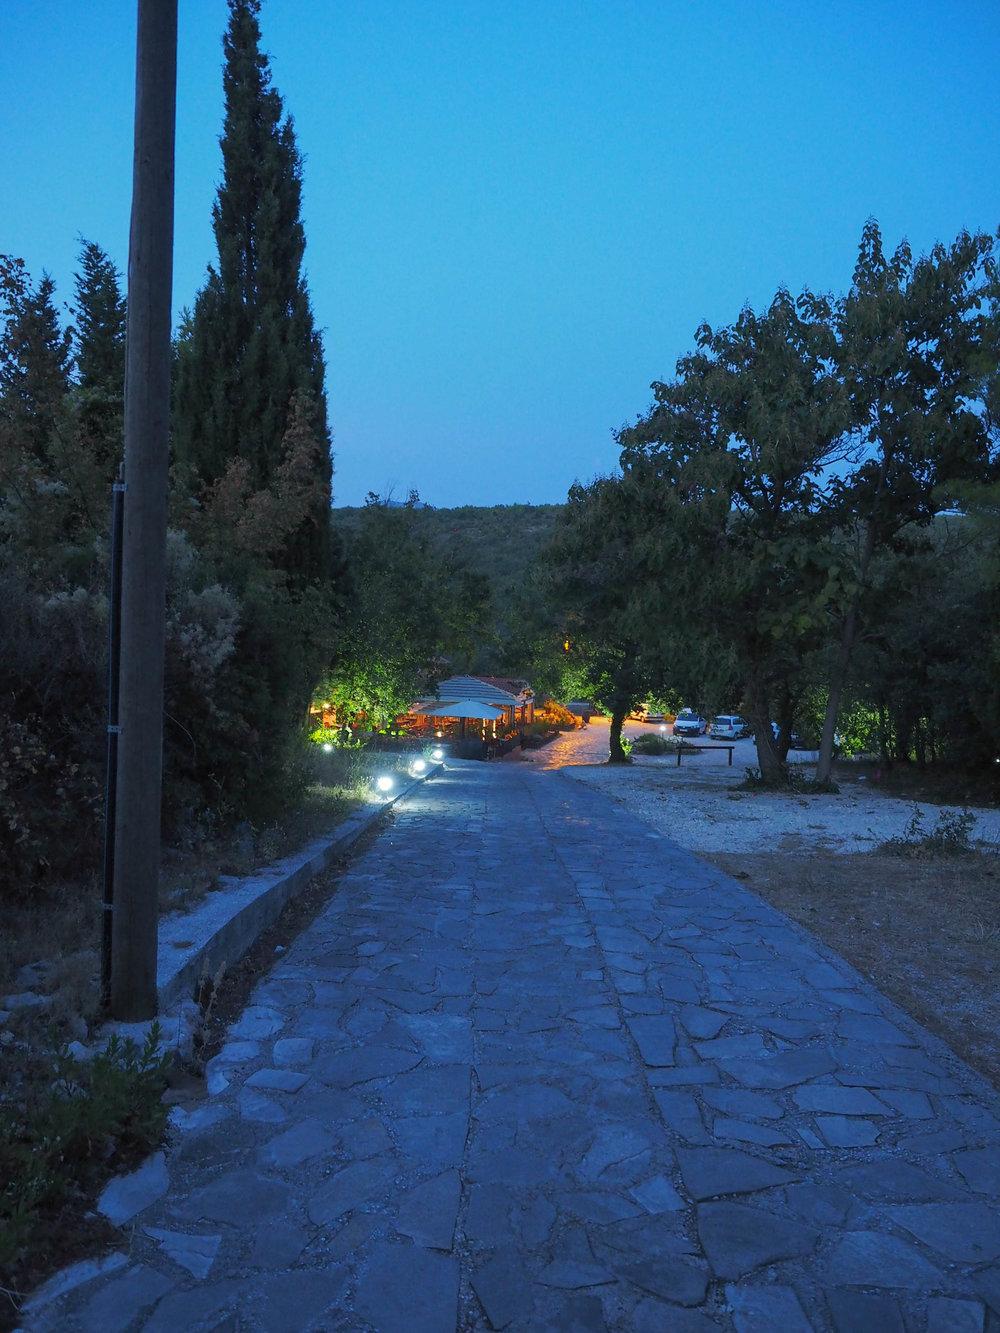 dubrovnik-croatia-day-2-34